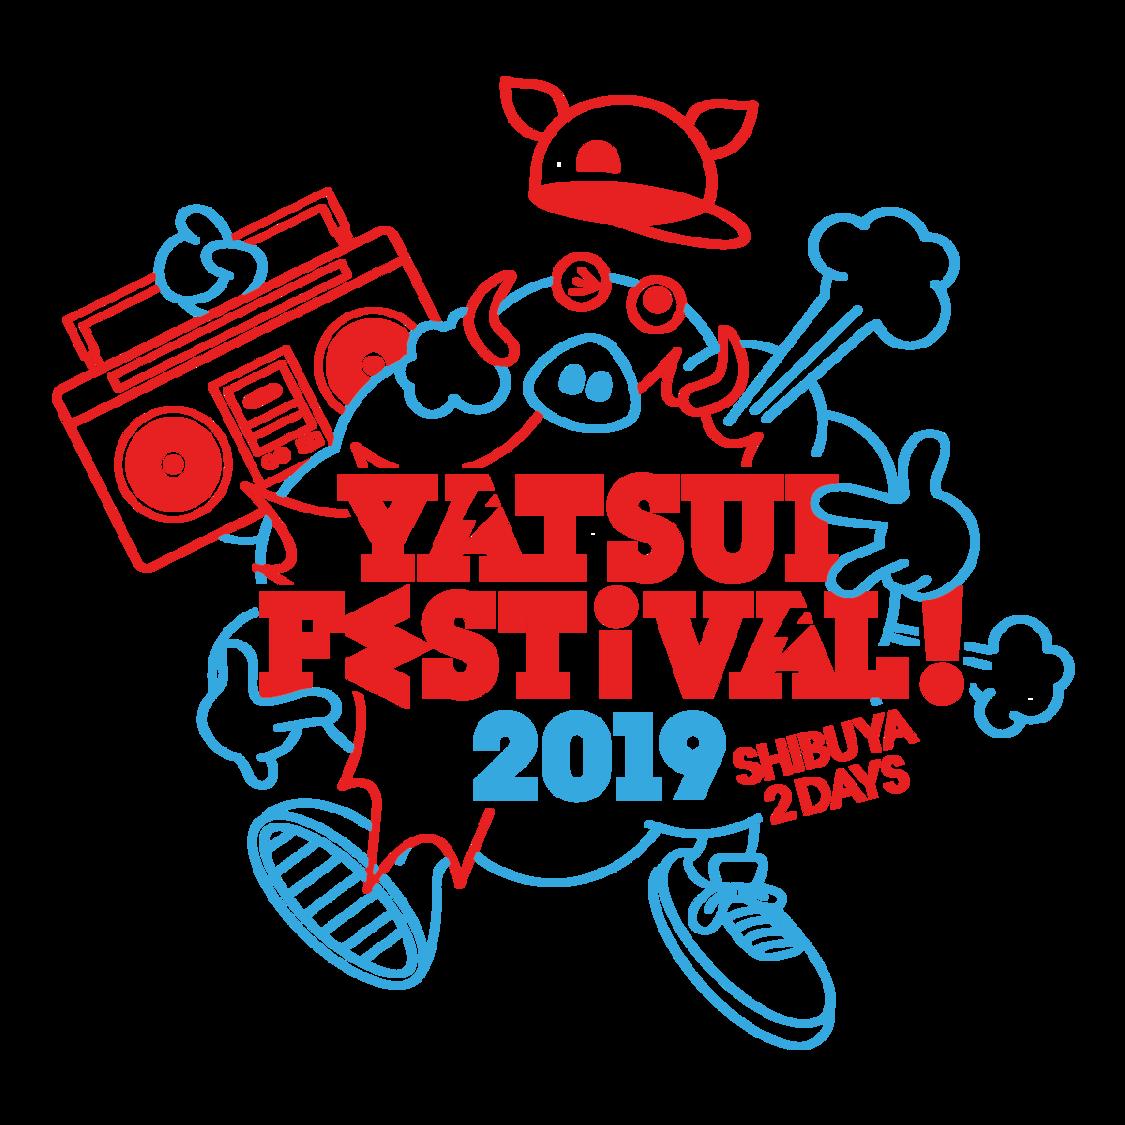 <YATSUI FESTIVAL!2019>第5弾に天晴れ!原宿、ギャンパレ、オサカナ、眉村ちあきら62組発表!